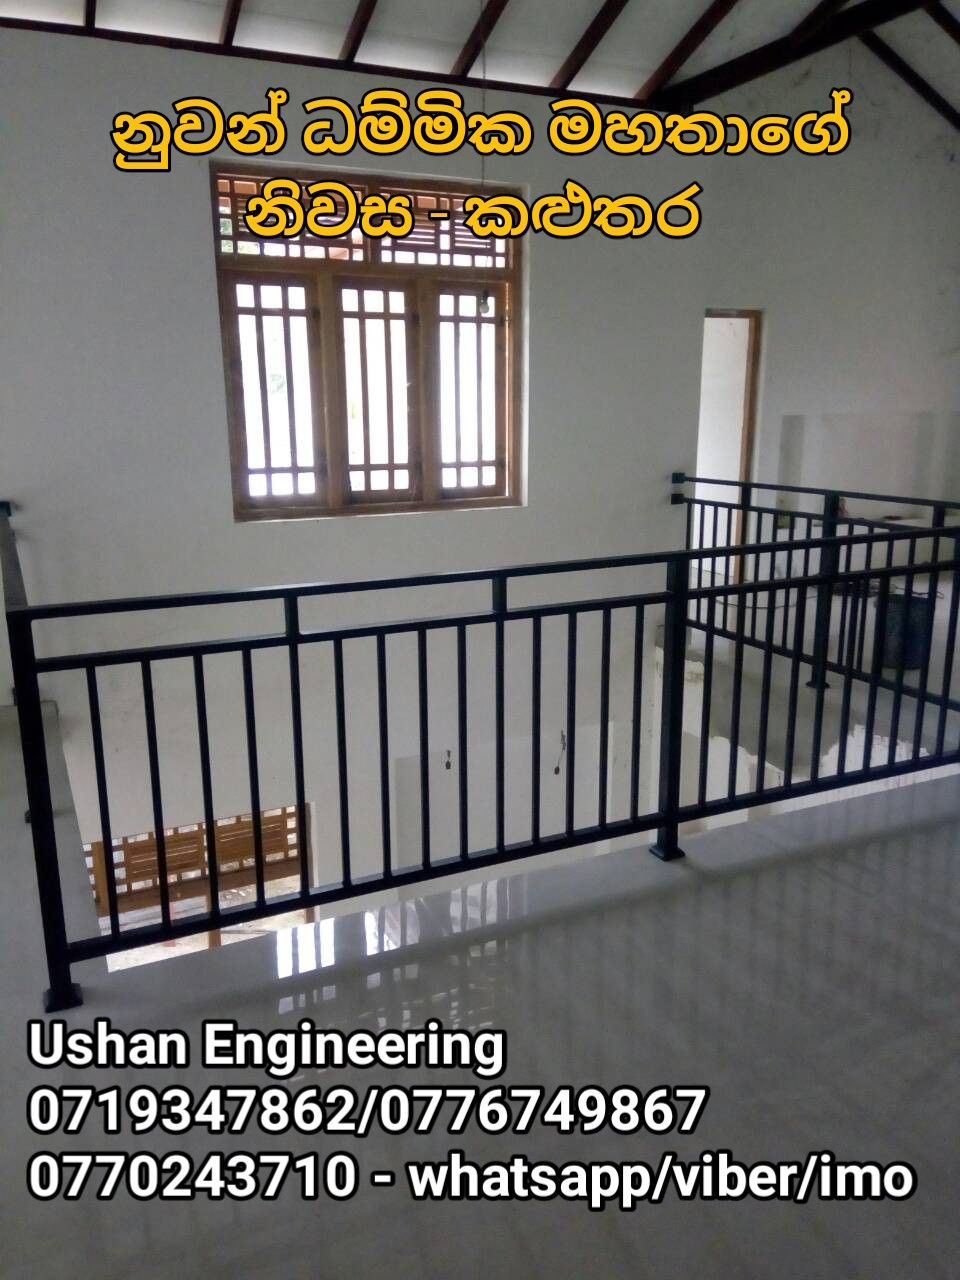 Handrail Design Sri Lanka Steel Balcony Railing Stair Cases Metal Hand  Pinte Also Raili Rh Pinterest